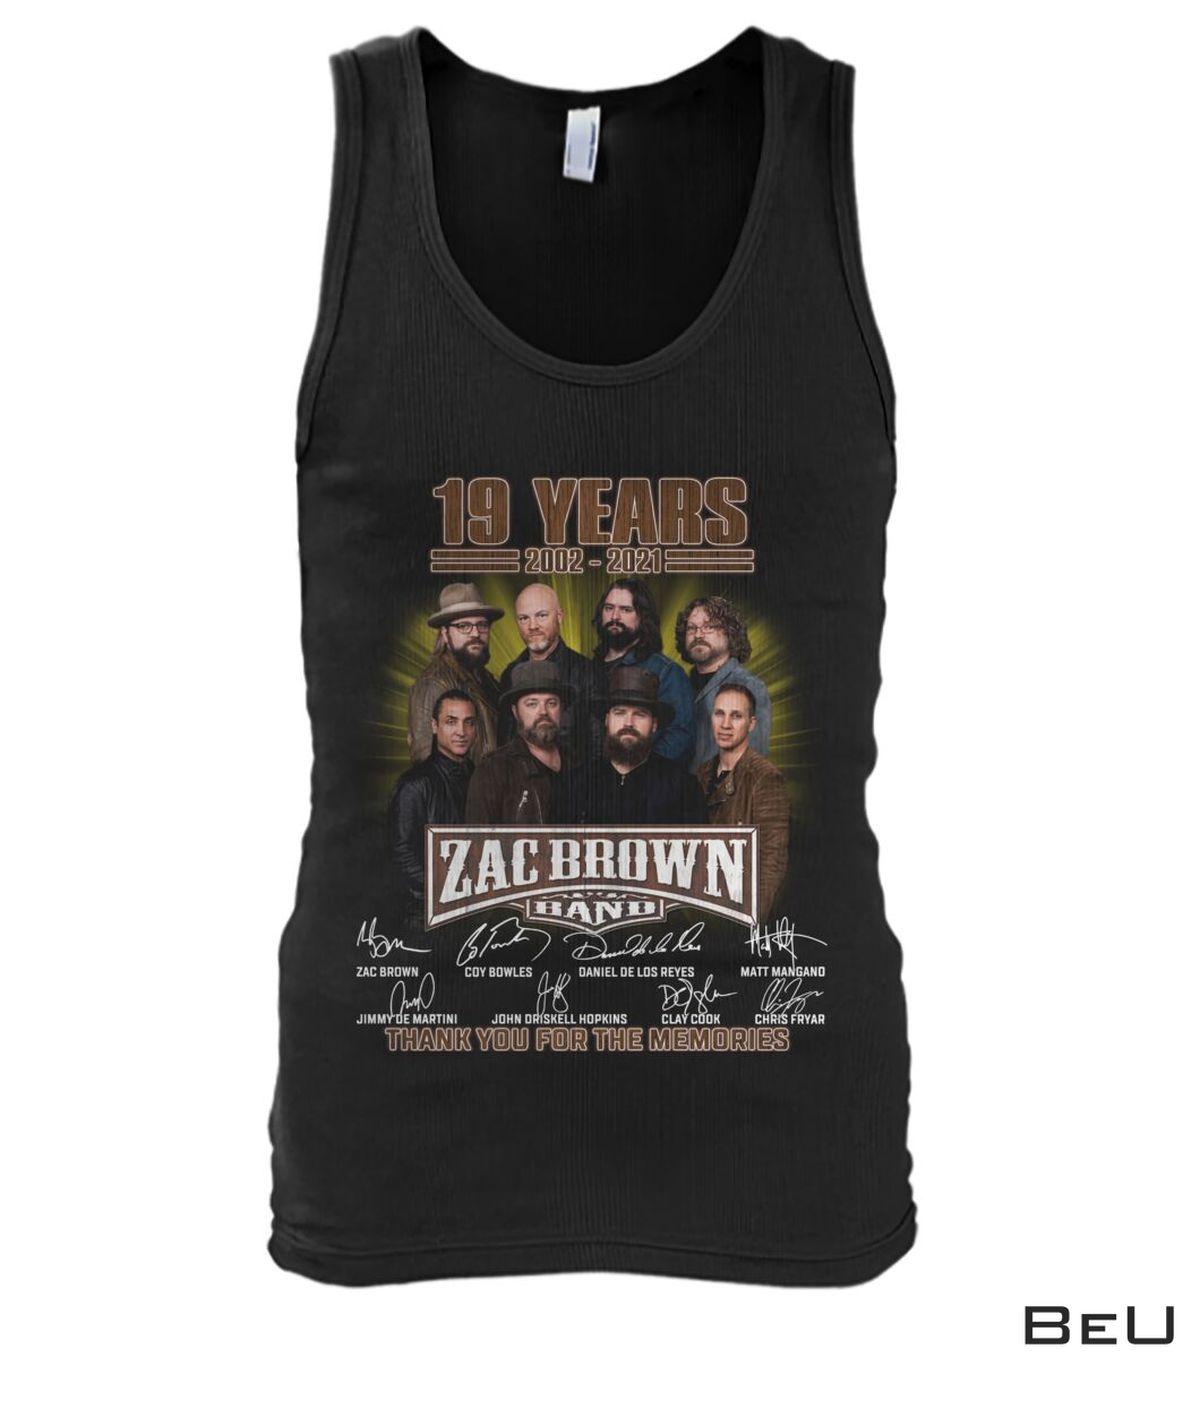 Print On Demand Zac Brown Band 19th Anniversary Shirt, hoodie, tank top